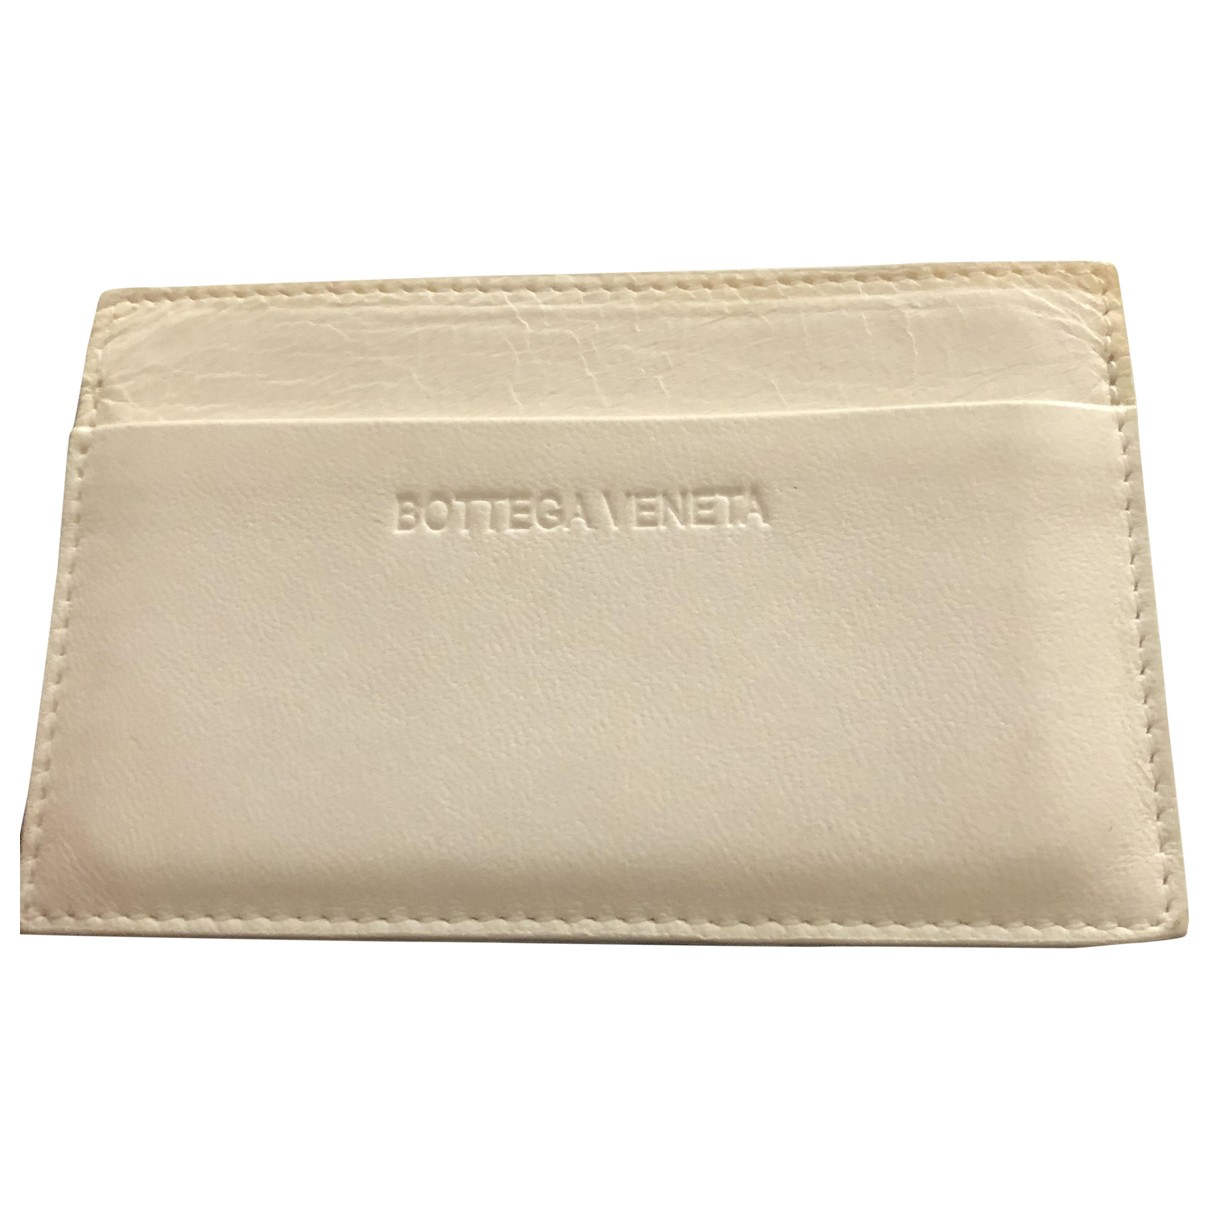 Bottega Veneta - Petite maroquinerie   pour femme en cuir - blanc